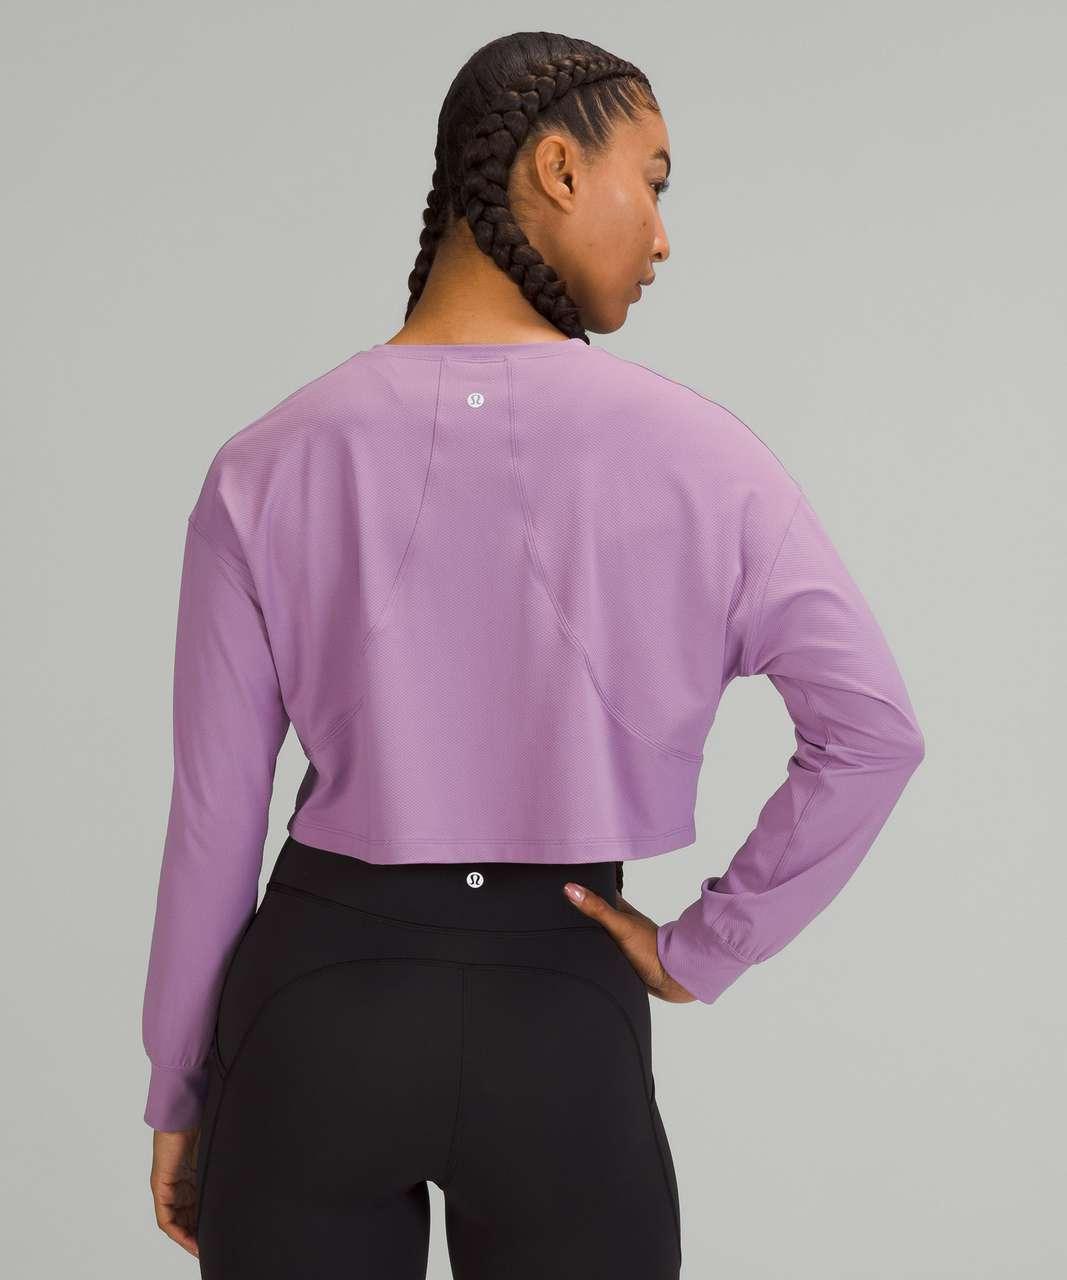 Lululemon Muscle Love Long Sleeve Shirt - Wisteria Purple